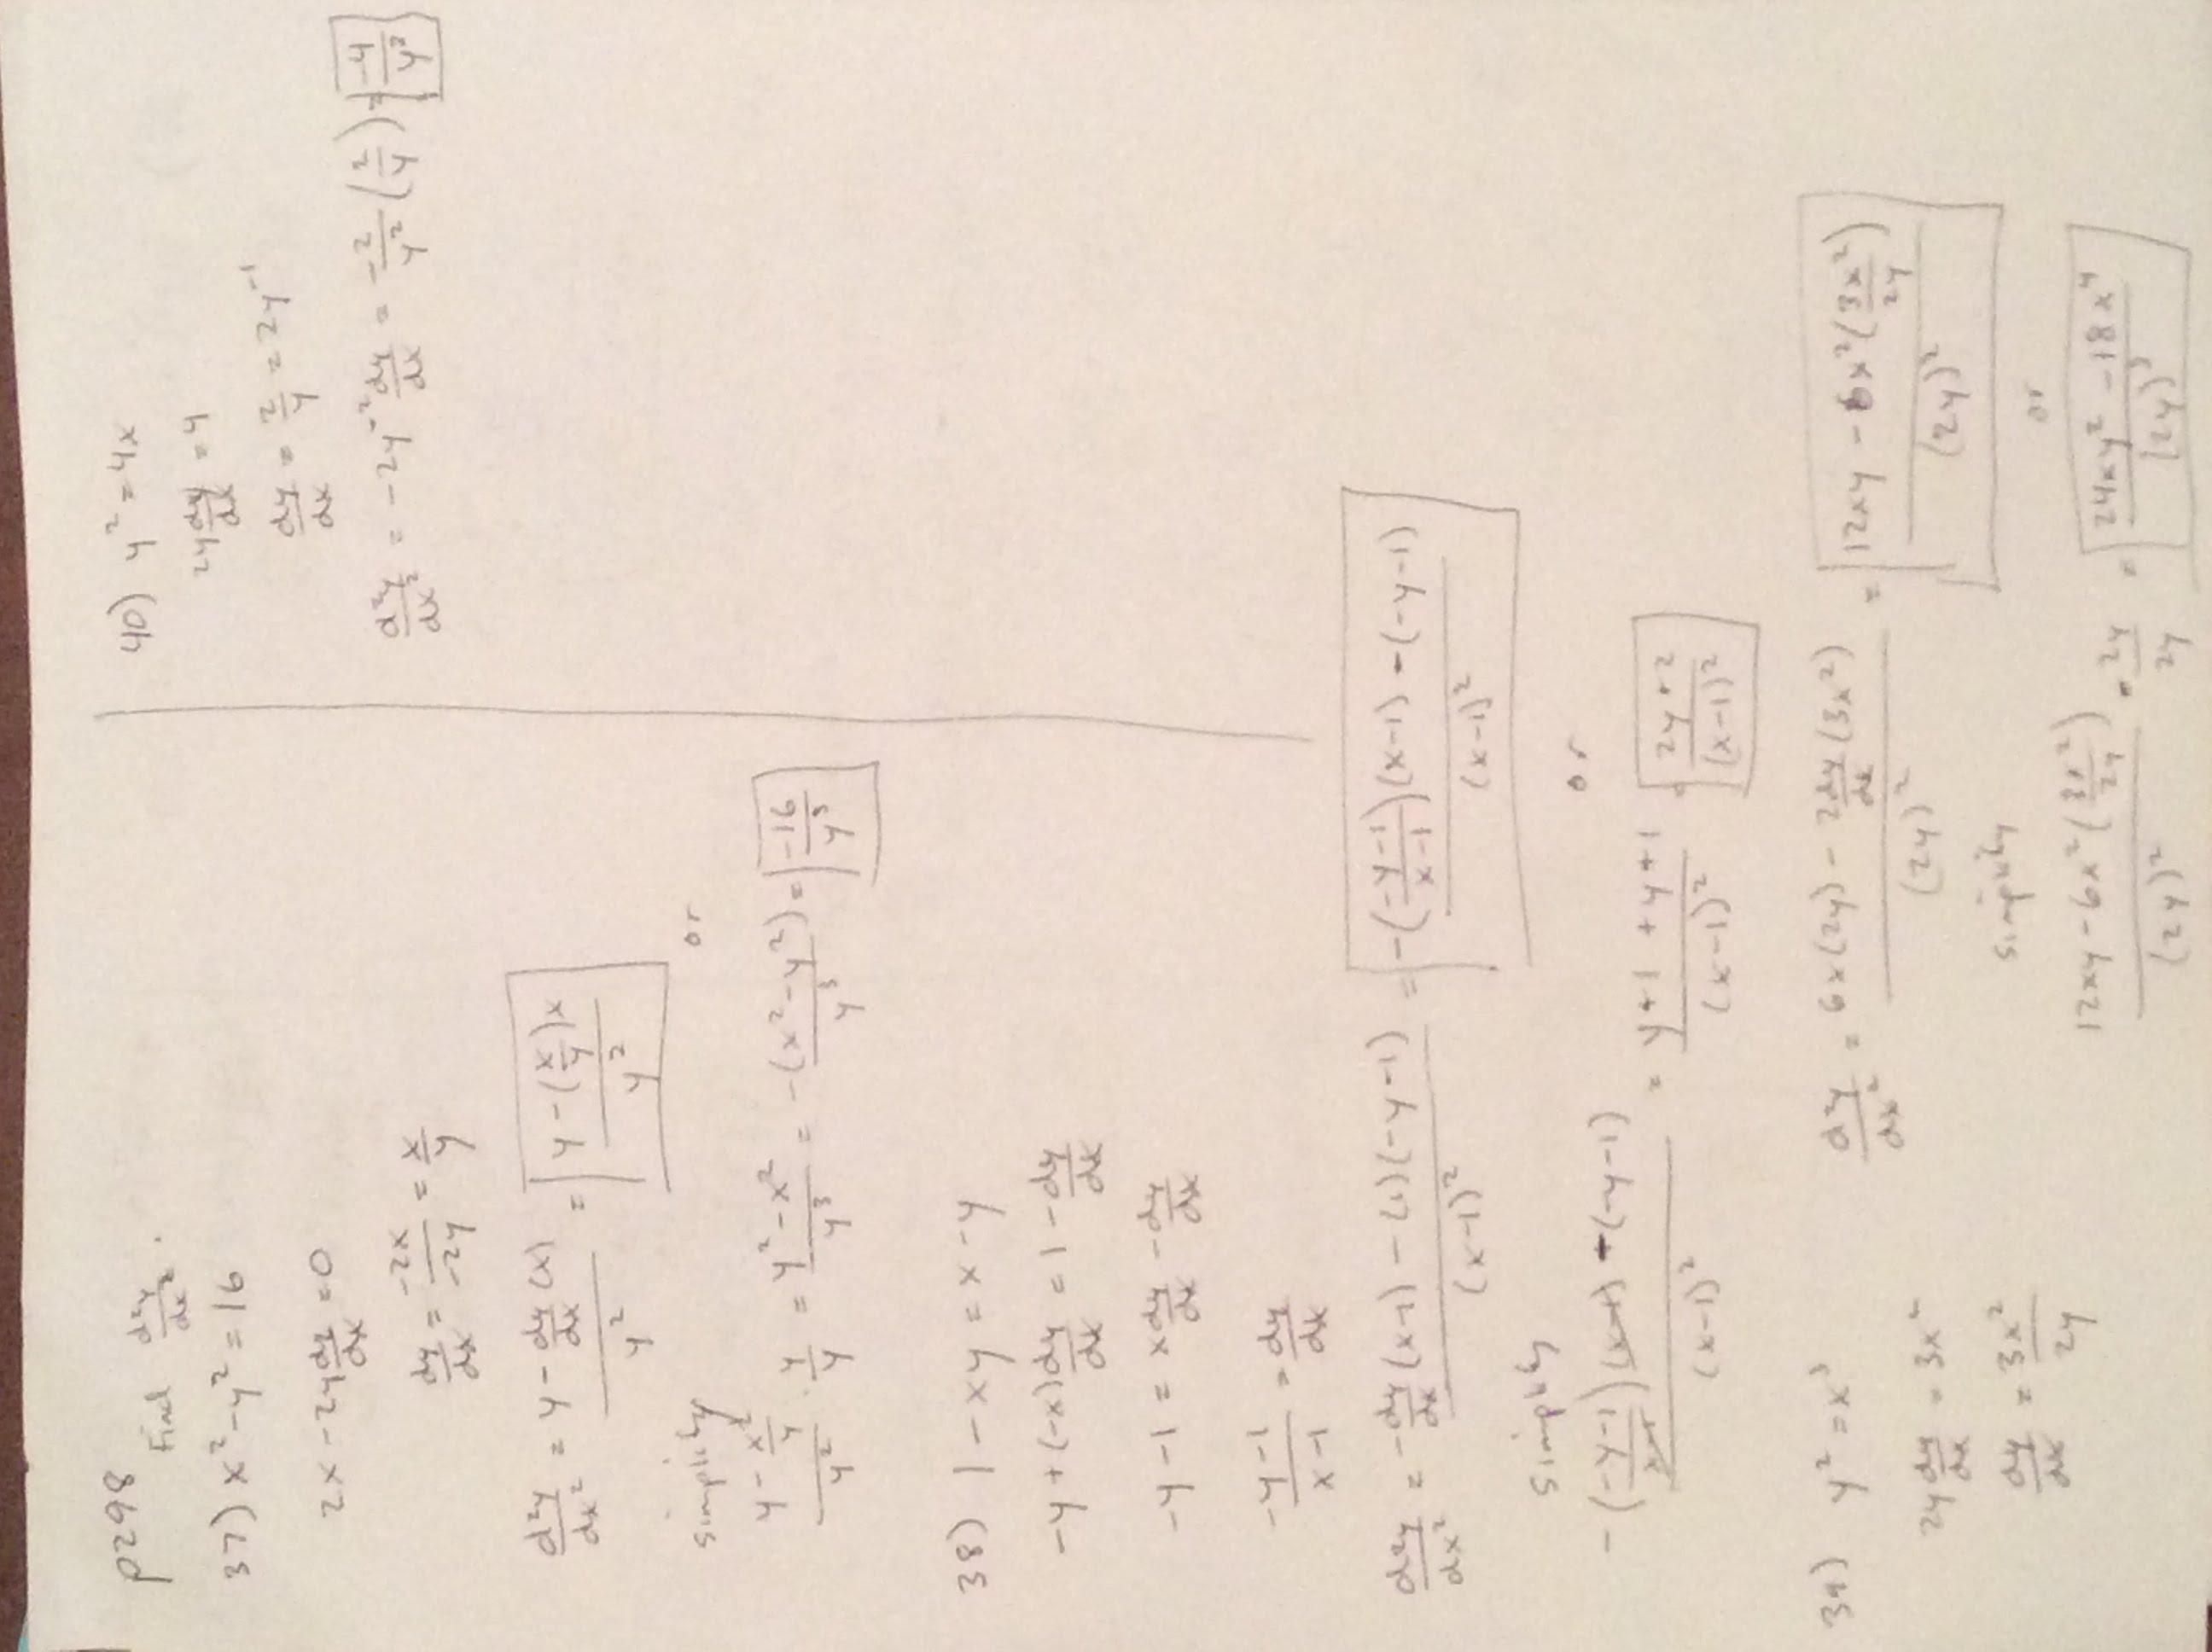 Pre Calc Assignments